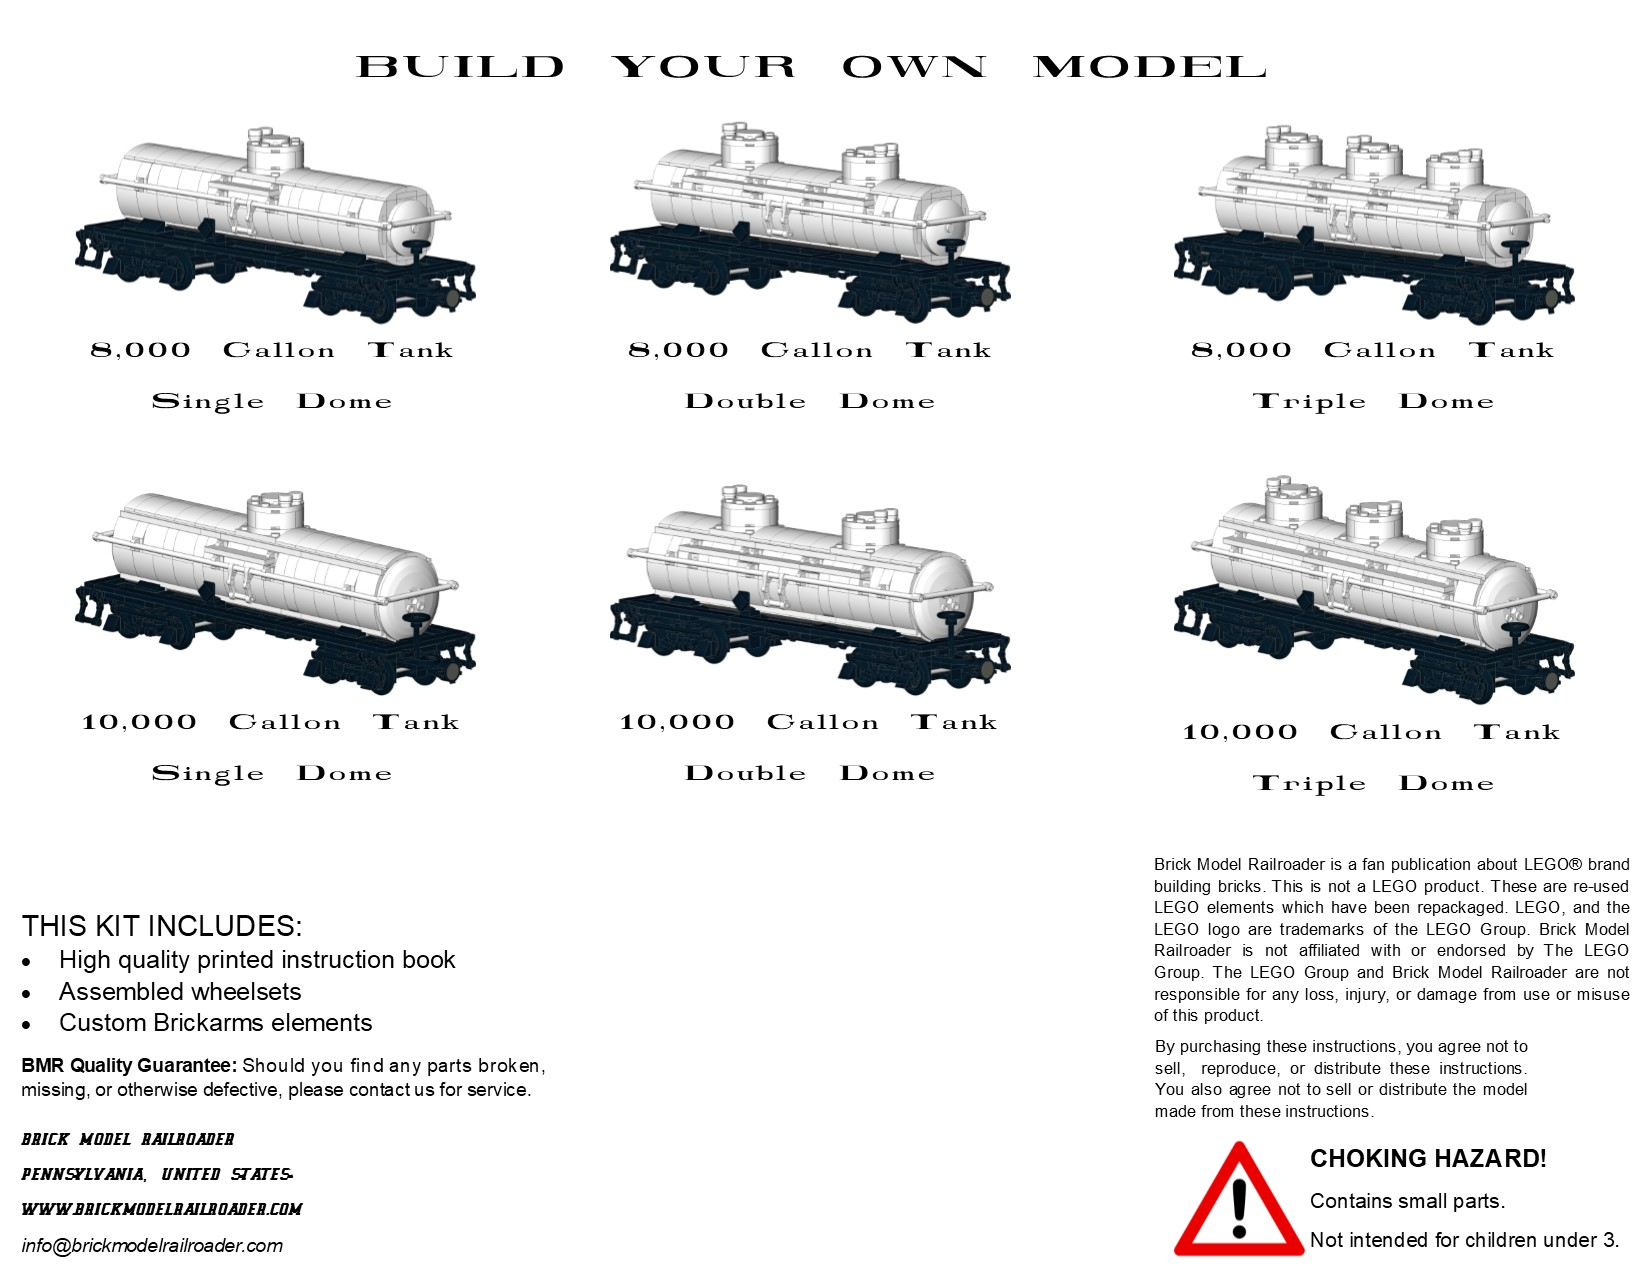 American Car & Foundry Type 27 Tank Car Premium Instructions   Brick ...